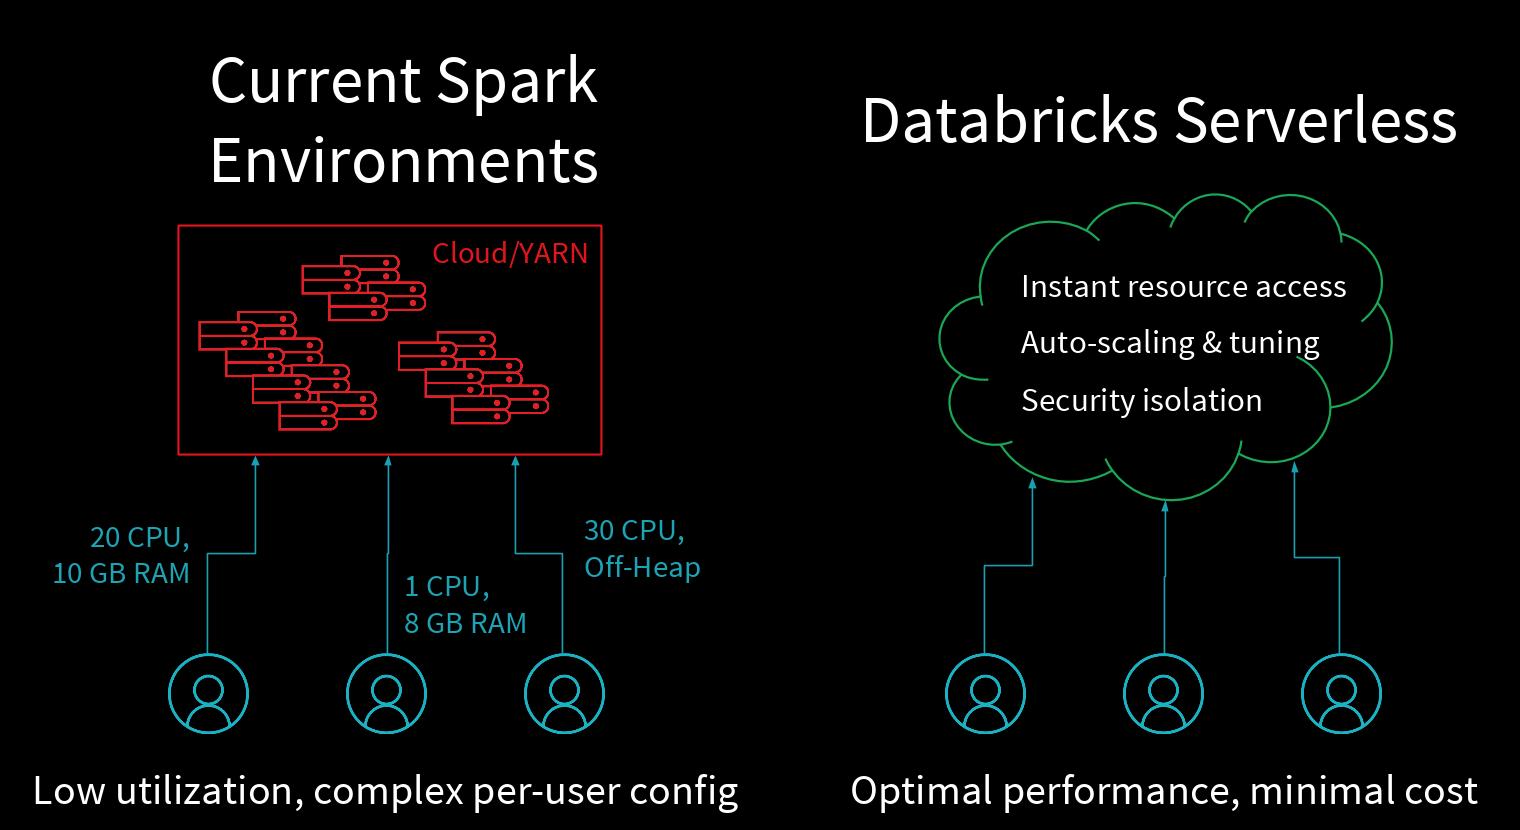 Databricks Serverless